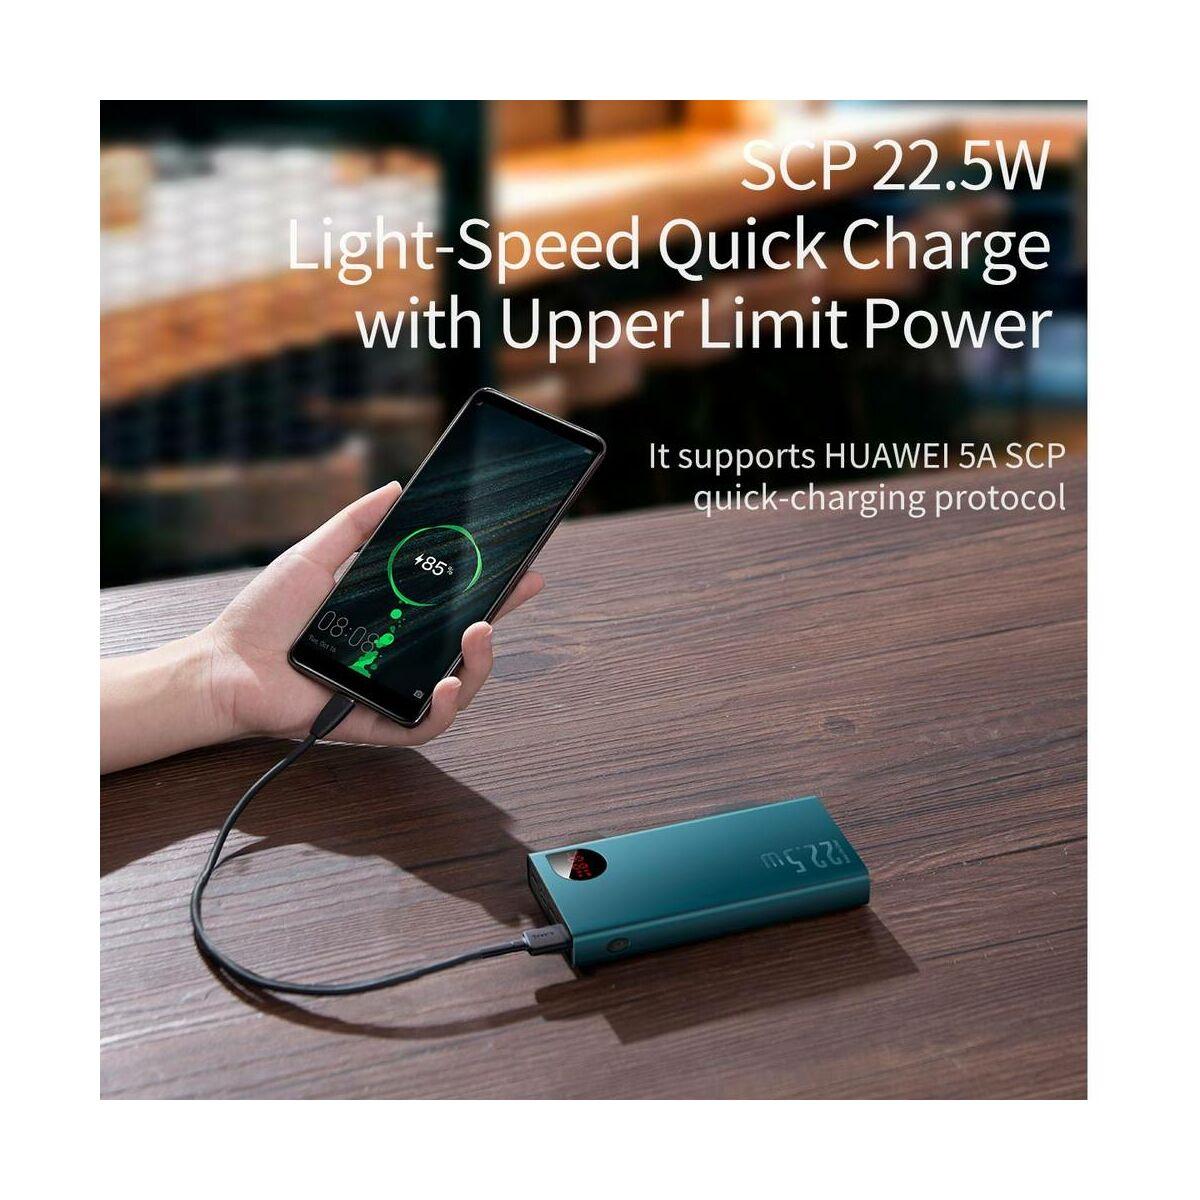 Baseus Power Bank Adaman PD3.0 18W, Quick Charge QC3.0 22.5W, 20000 mAh, zöld (PPIMDA-A06)